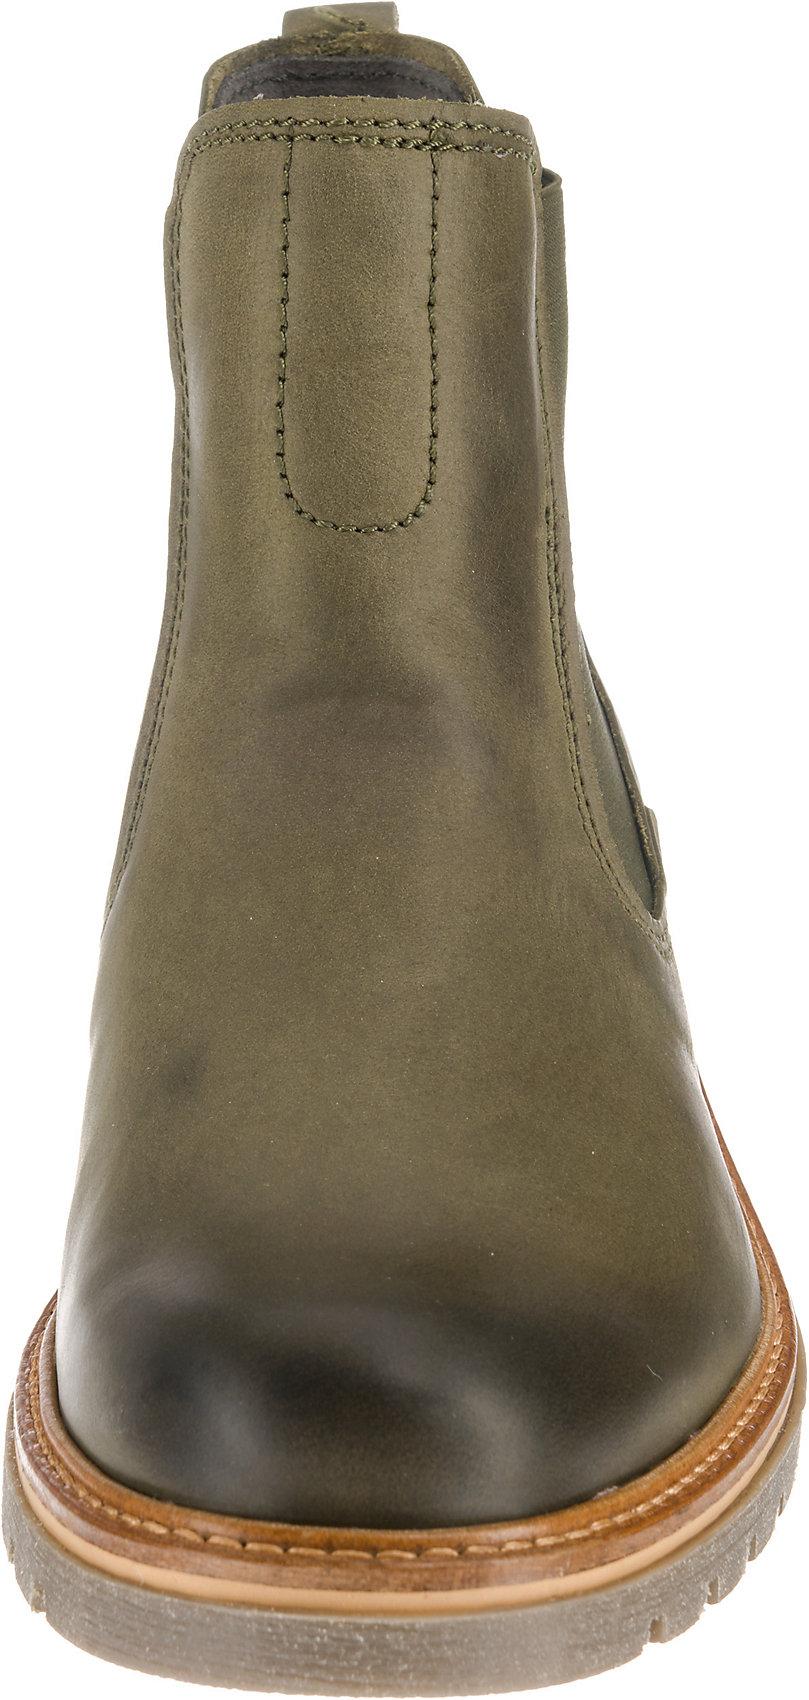 promo code 7eb4c 312ac Details zu Neu camel active Canberra Chelsea Boots 8402832 für Damen oliv